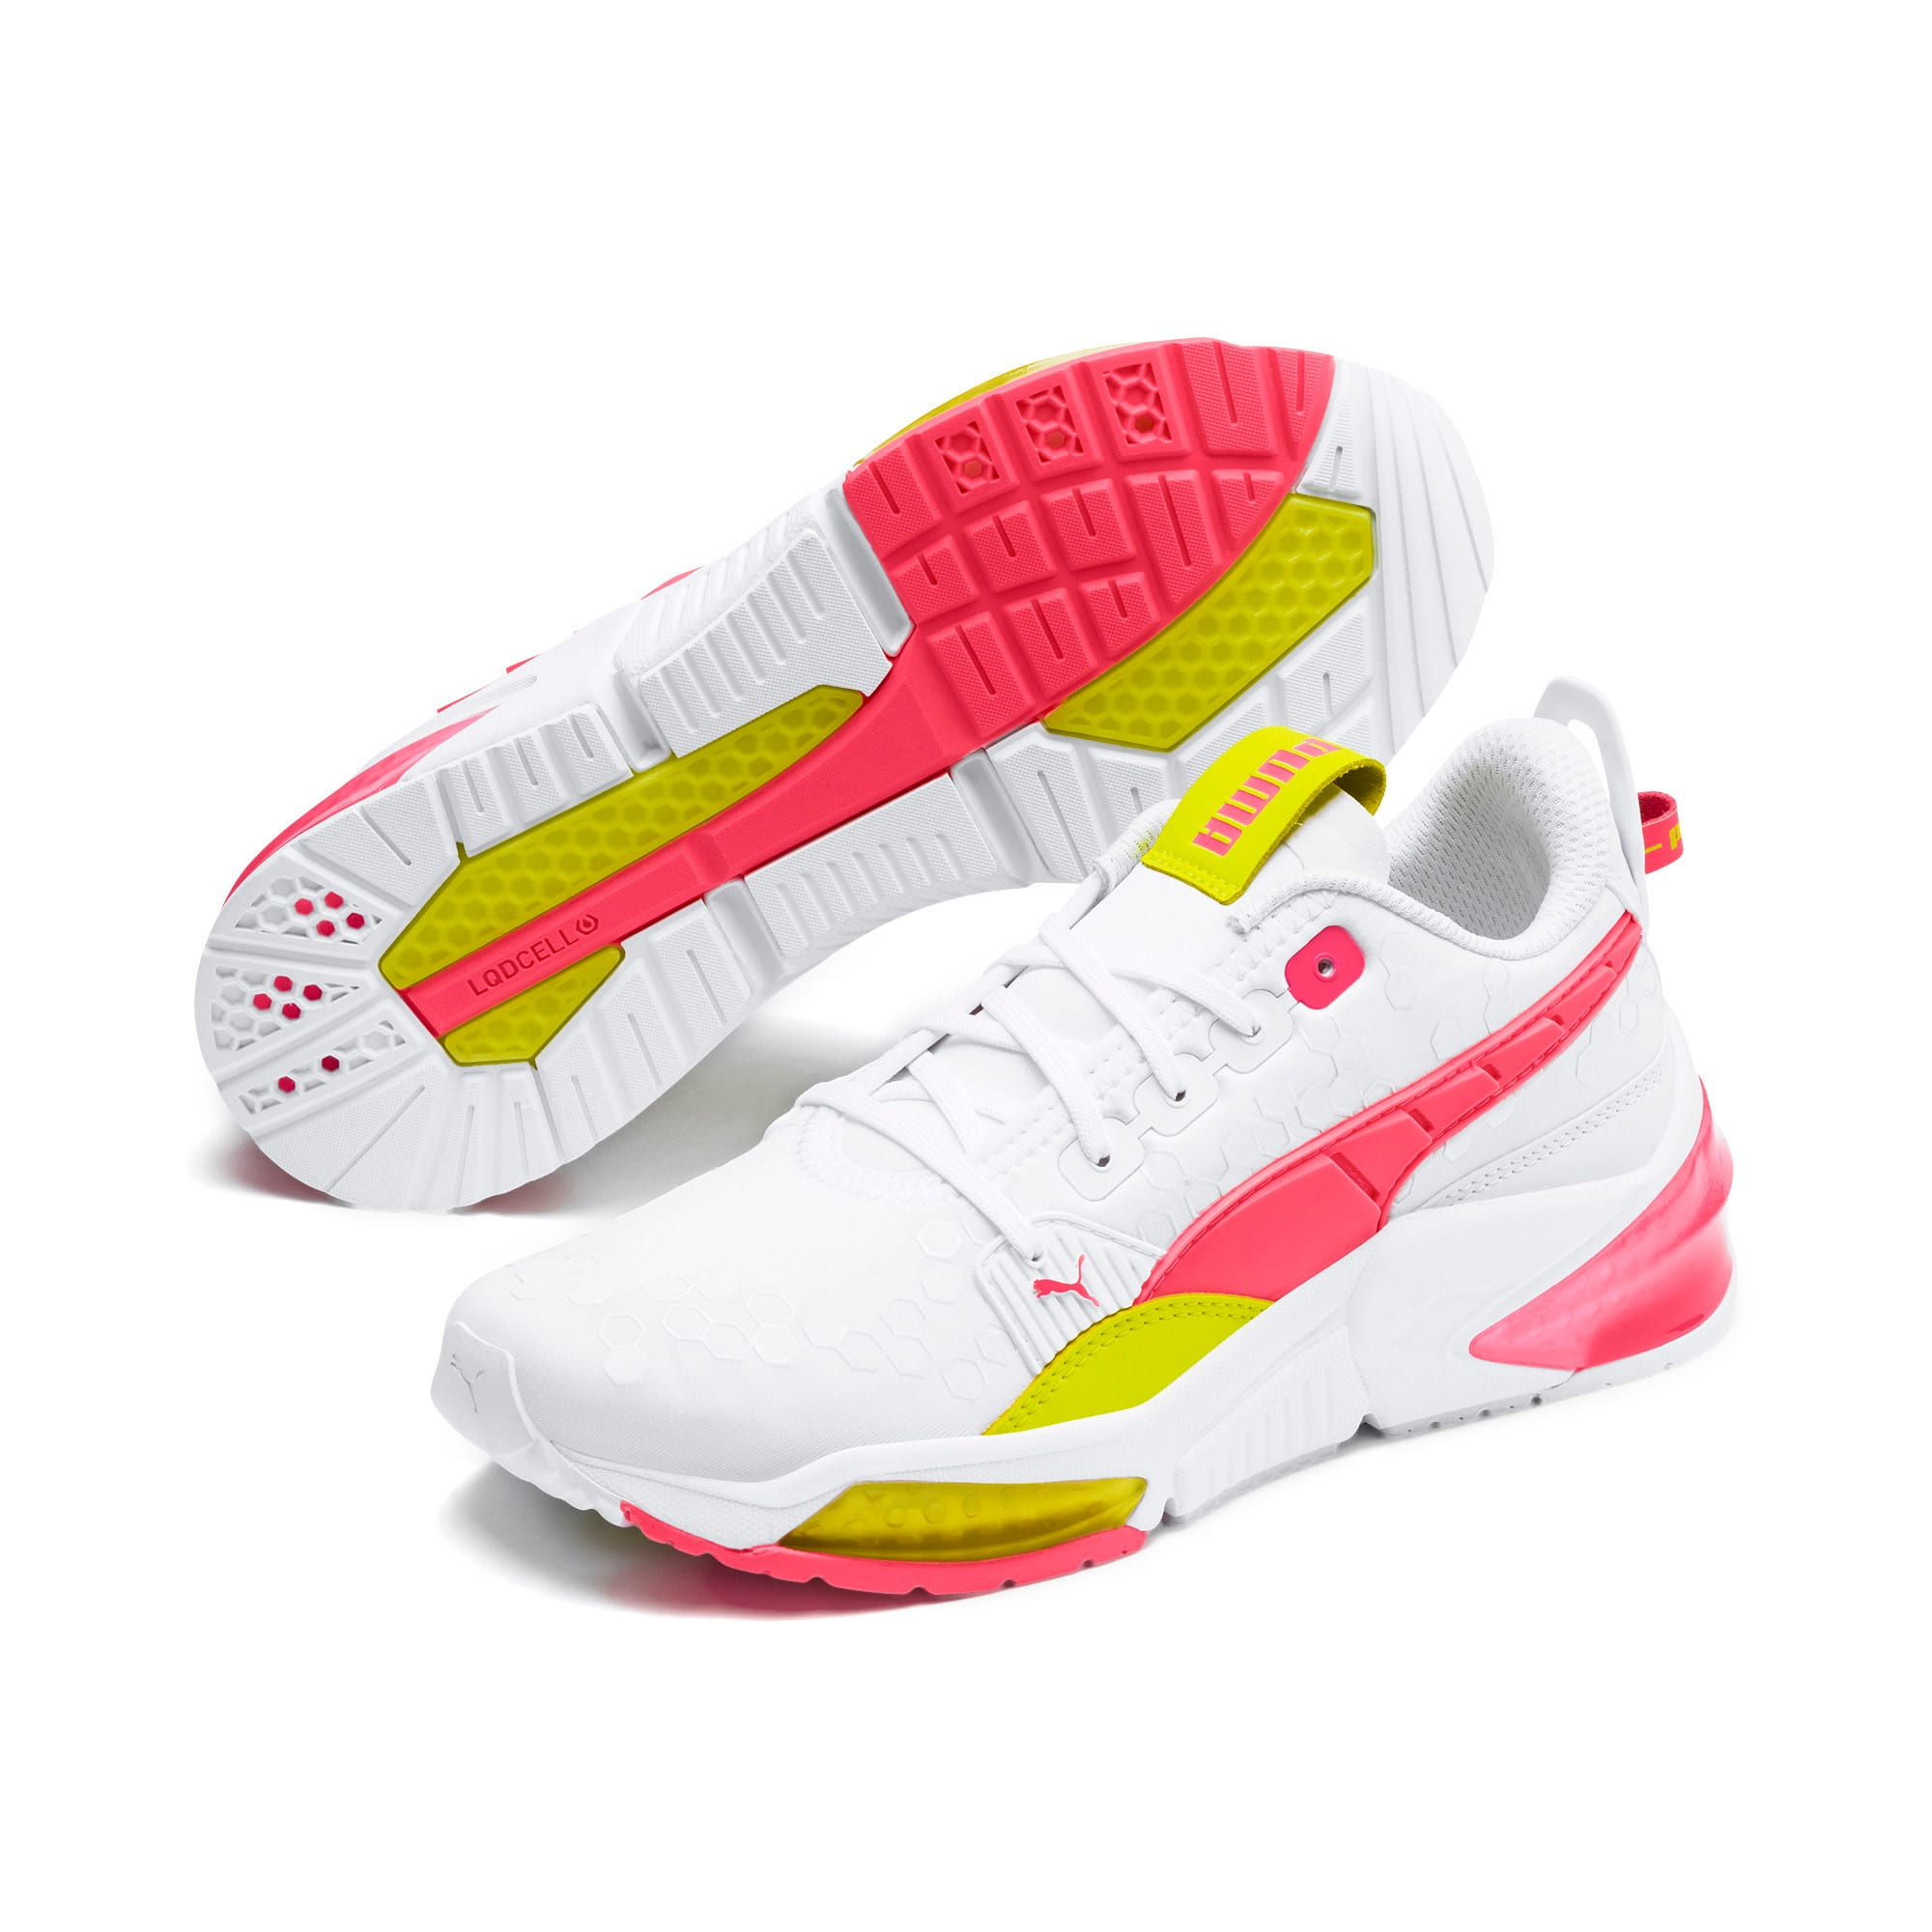 Thumbnail 3 of LQDCELL Optic Training Shoes, Puma White-Y Alert-Pin Alert, medium